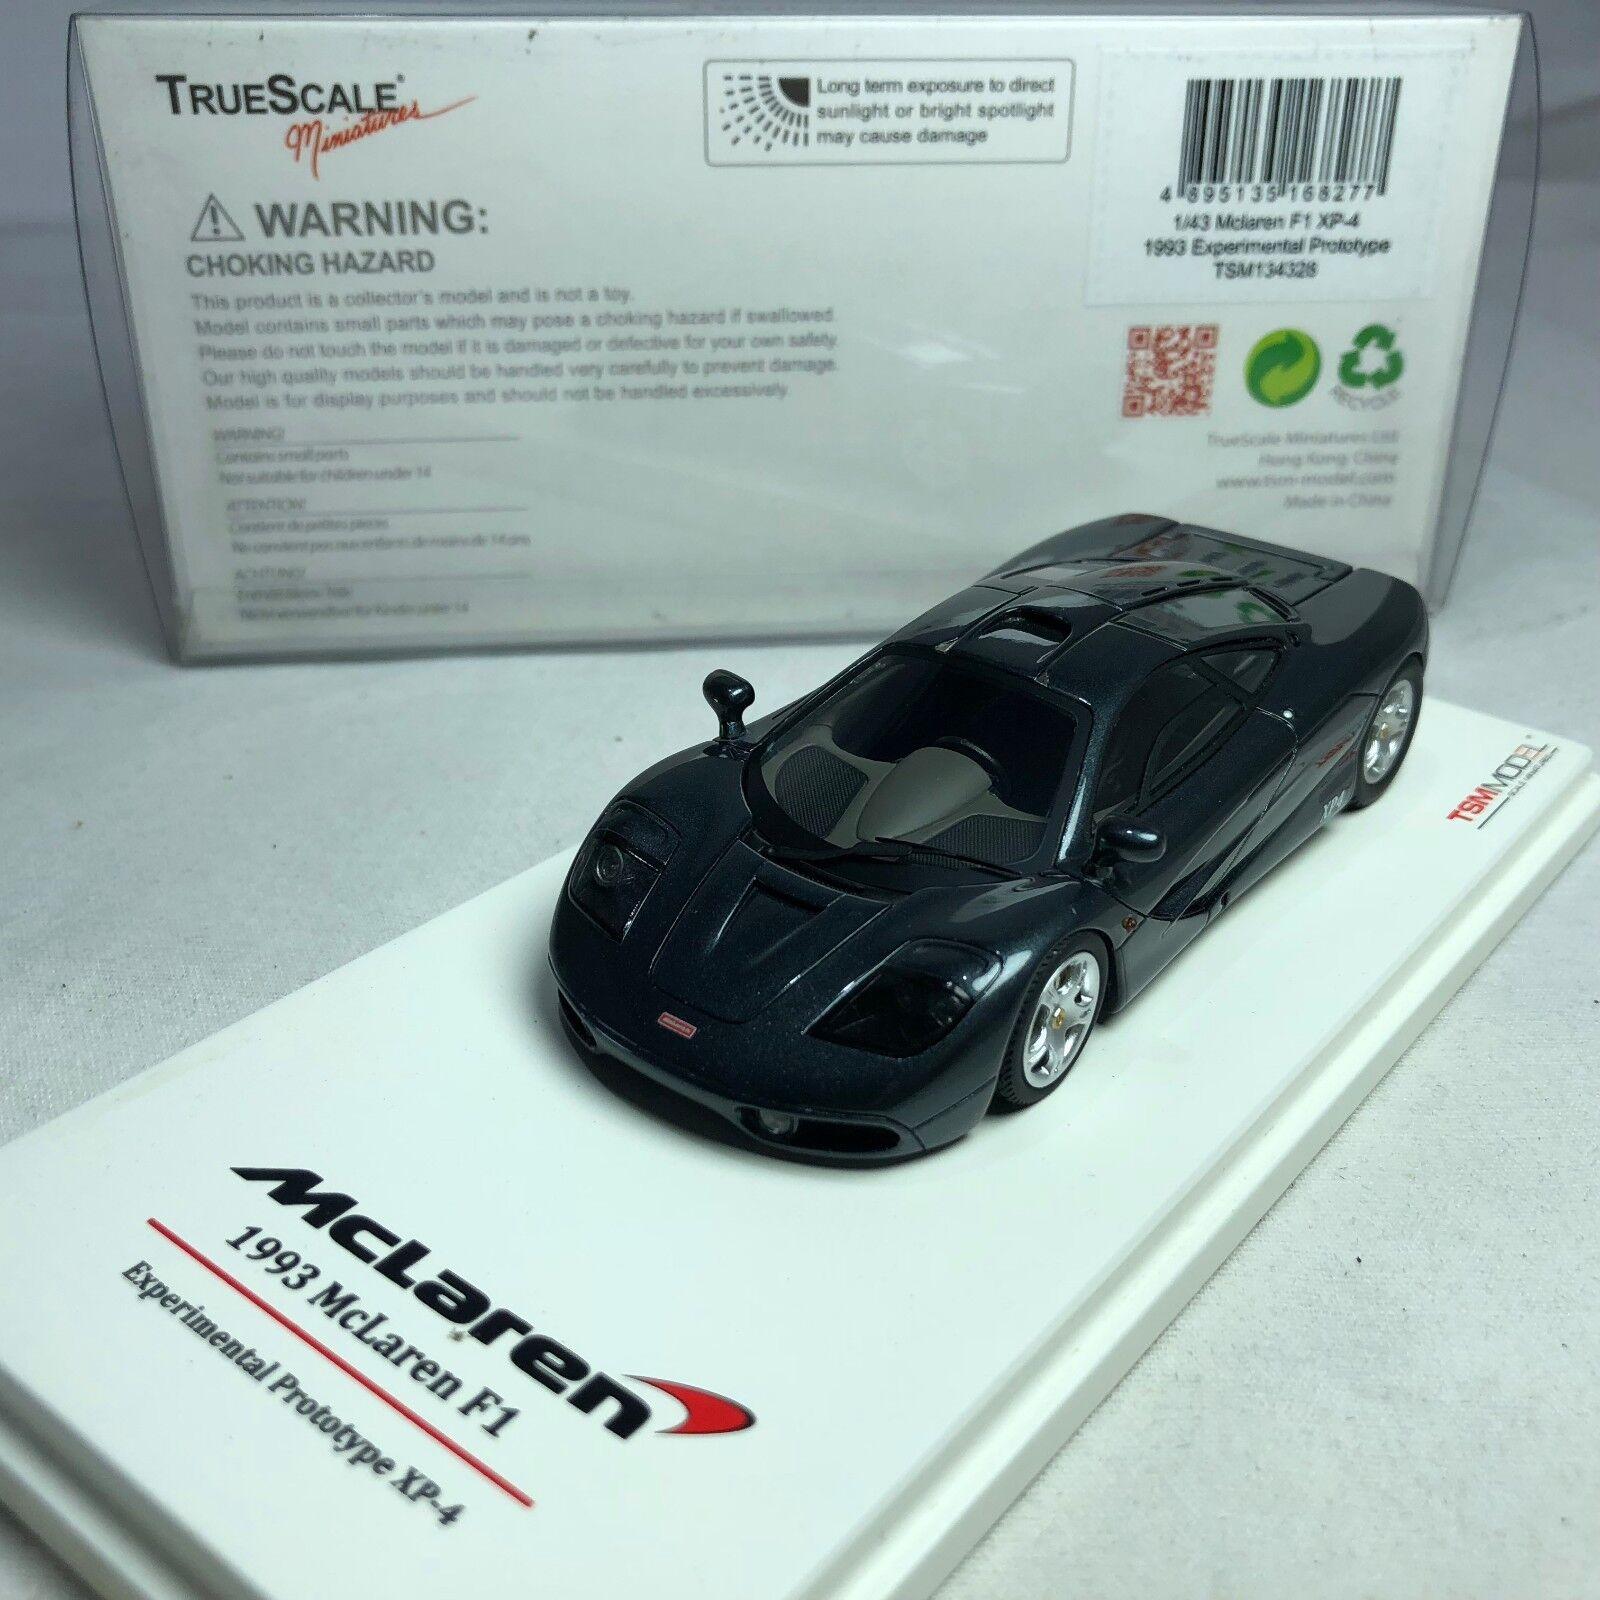 buy tsm model 1/43 tsm134328 mclaren f1 gtr xp-4 experimental